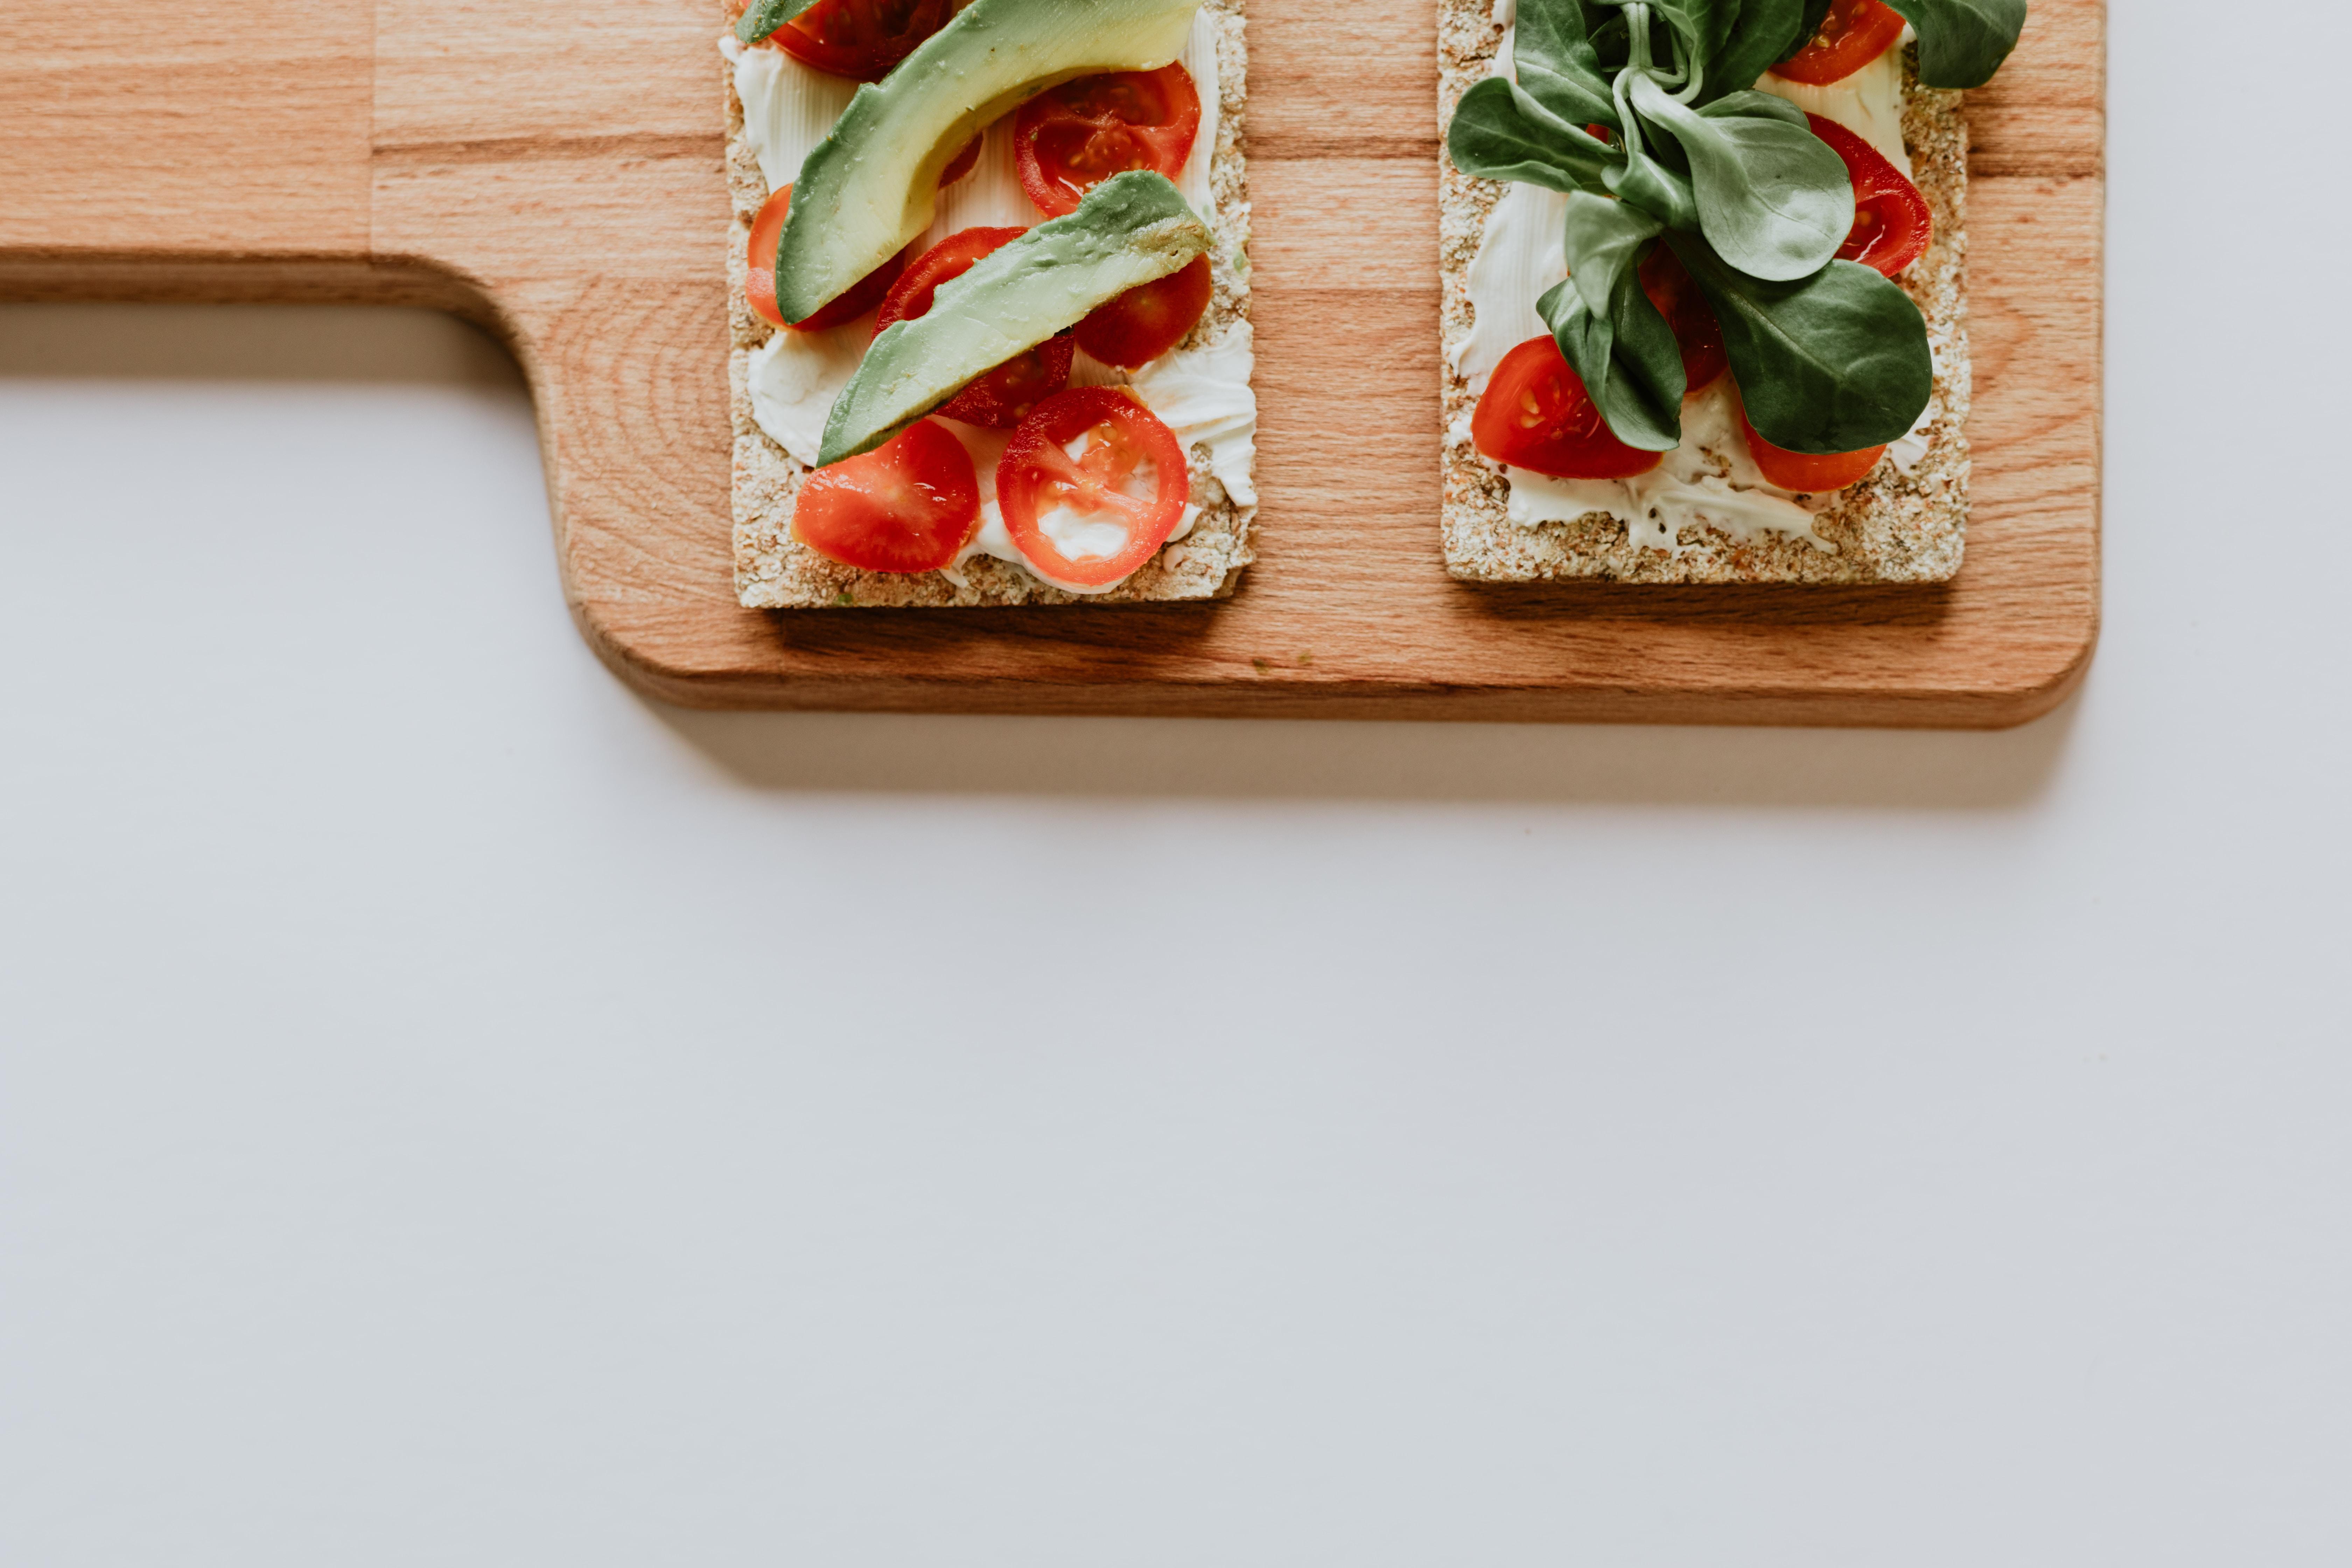 slice avocado and tomatoes on tray